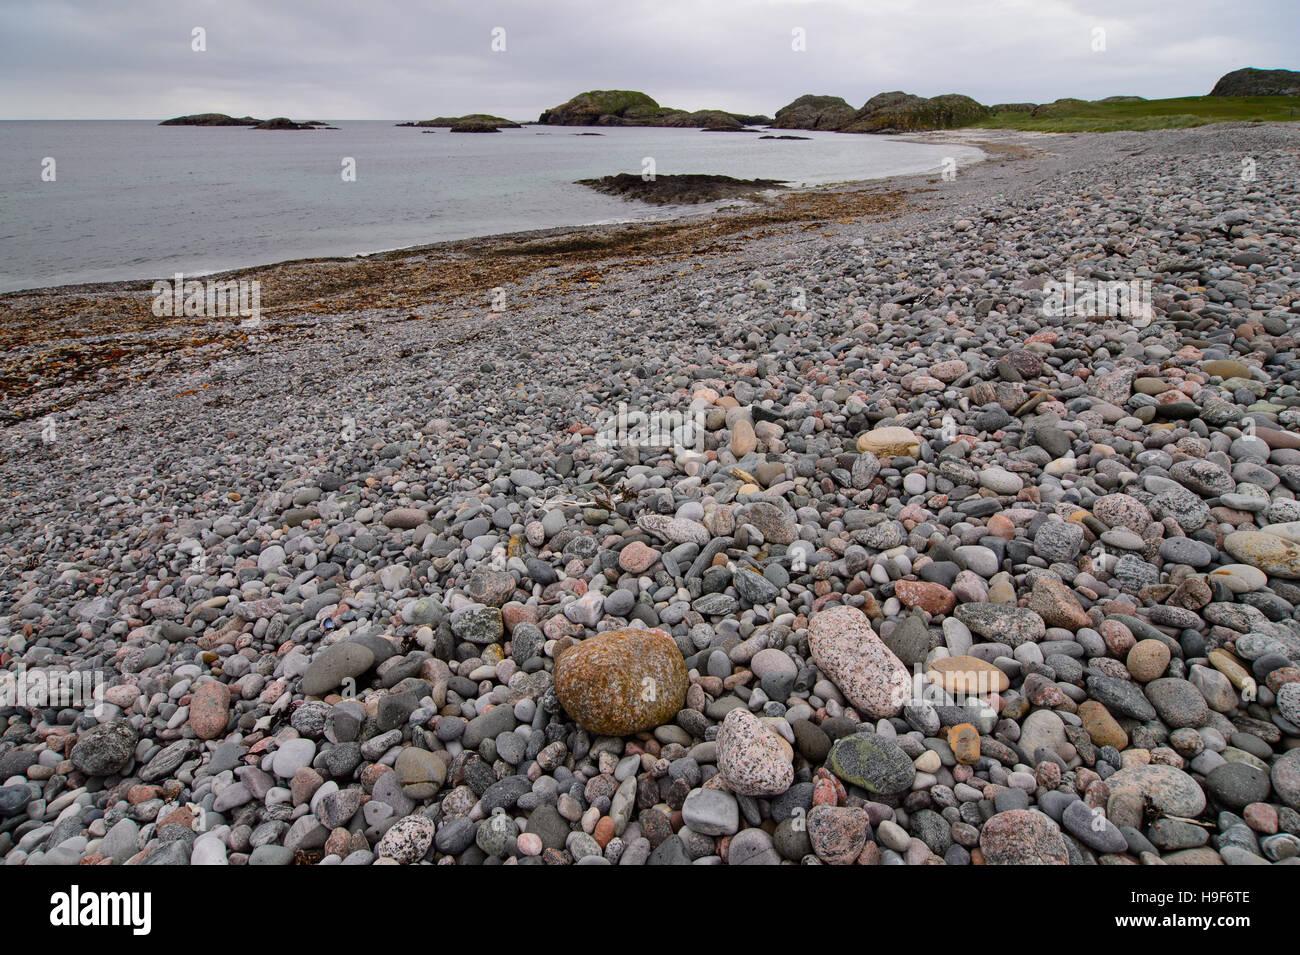 Pebble beach on Isle of Iona, Scotland - Stock Image